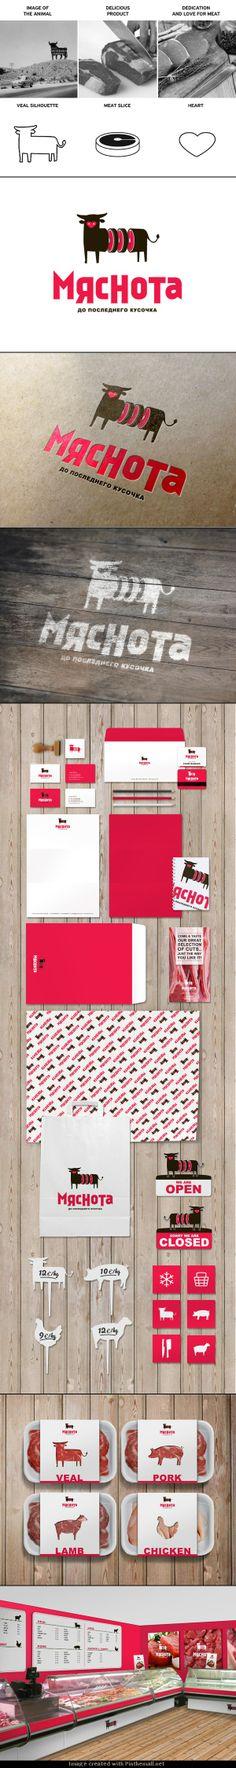 Мяснота: a butcher shop. Great meat #identity #packaging #branding PD - created via https://www.behance.net/gallery/mjasnota-a-butcher-shops-identity/12374247